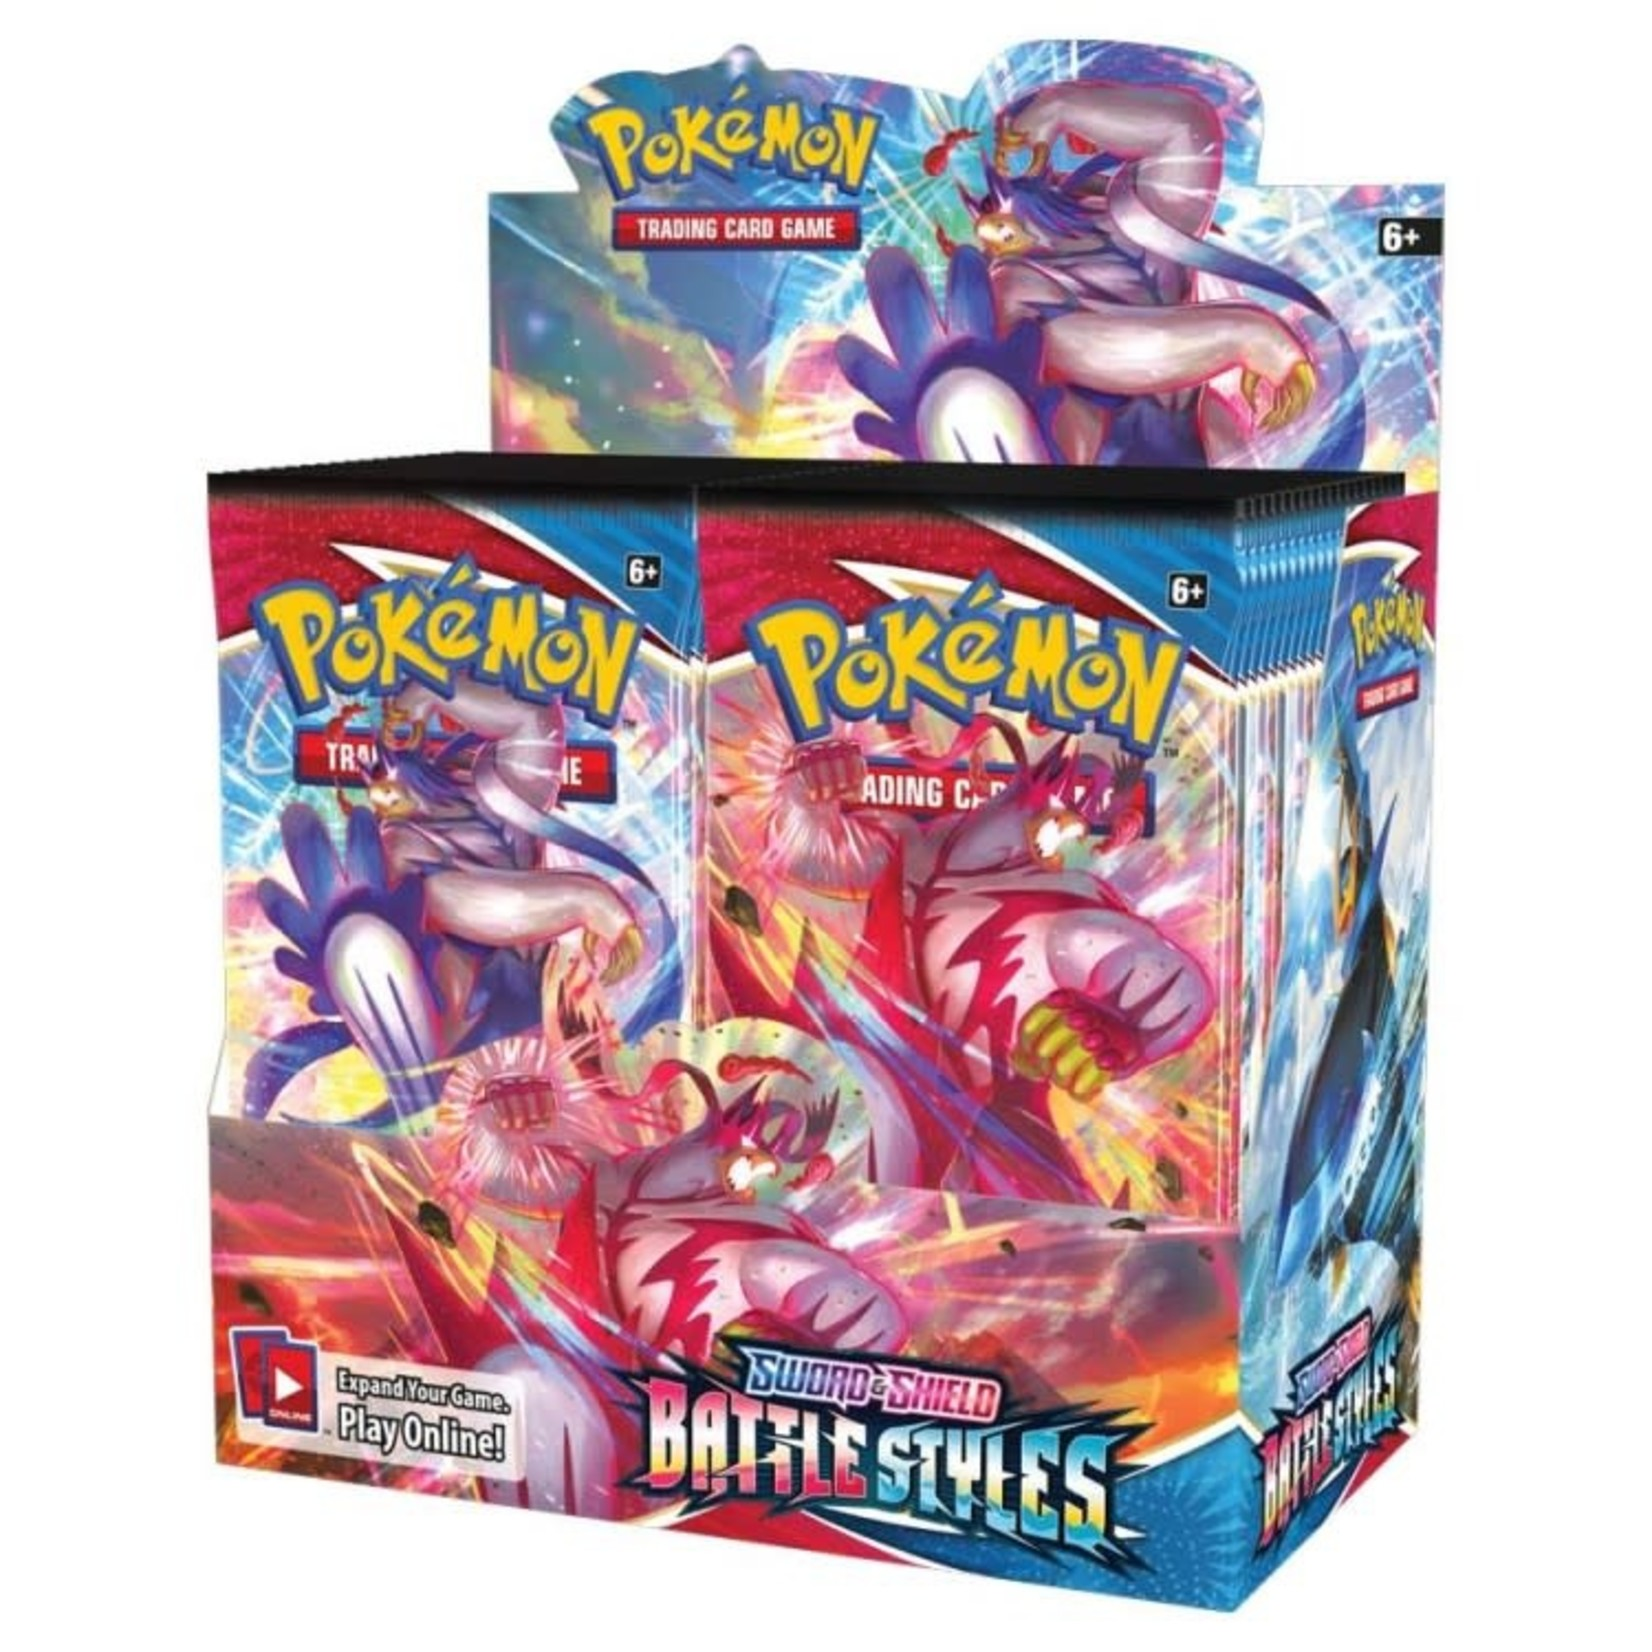 Pokemon International Pokemon Trading Card Game: Battle Styles Booster Box